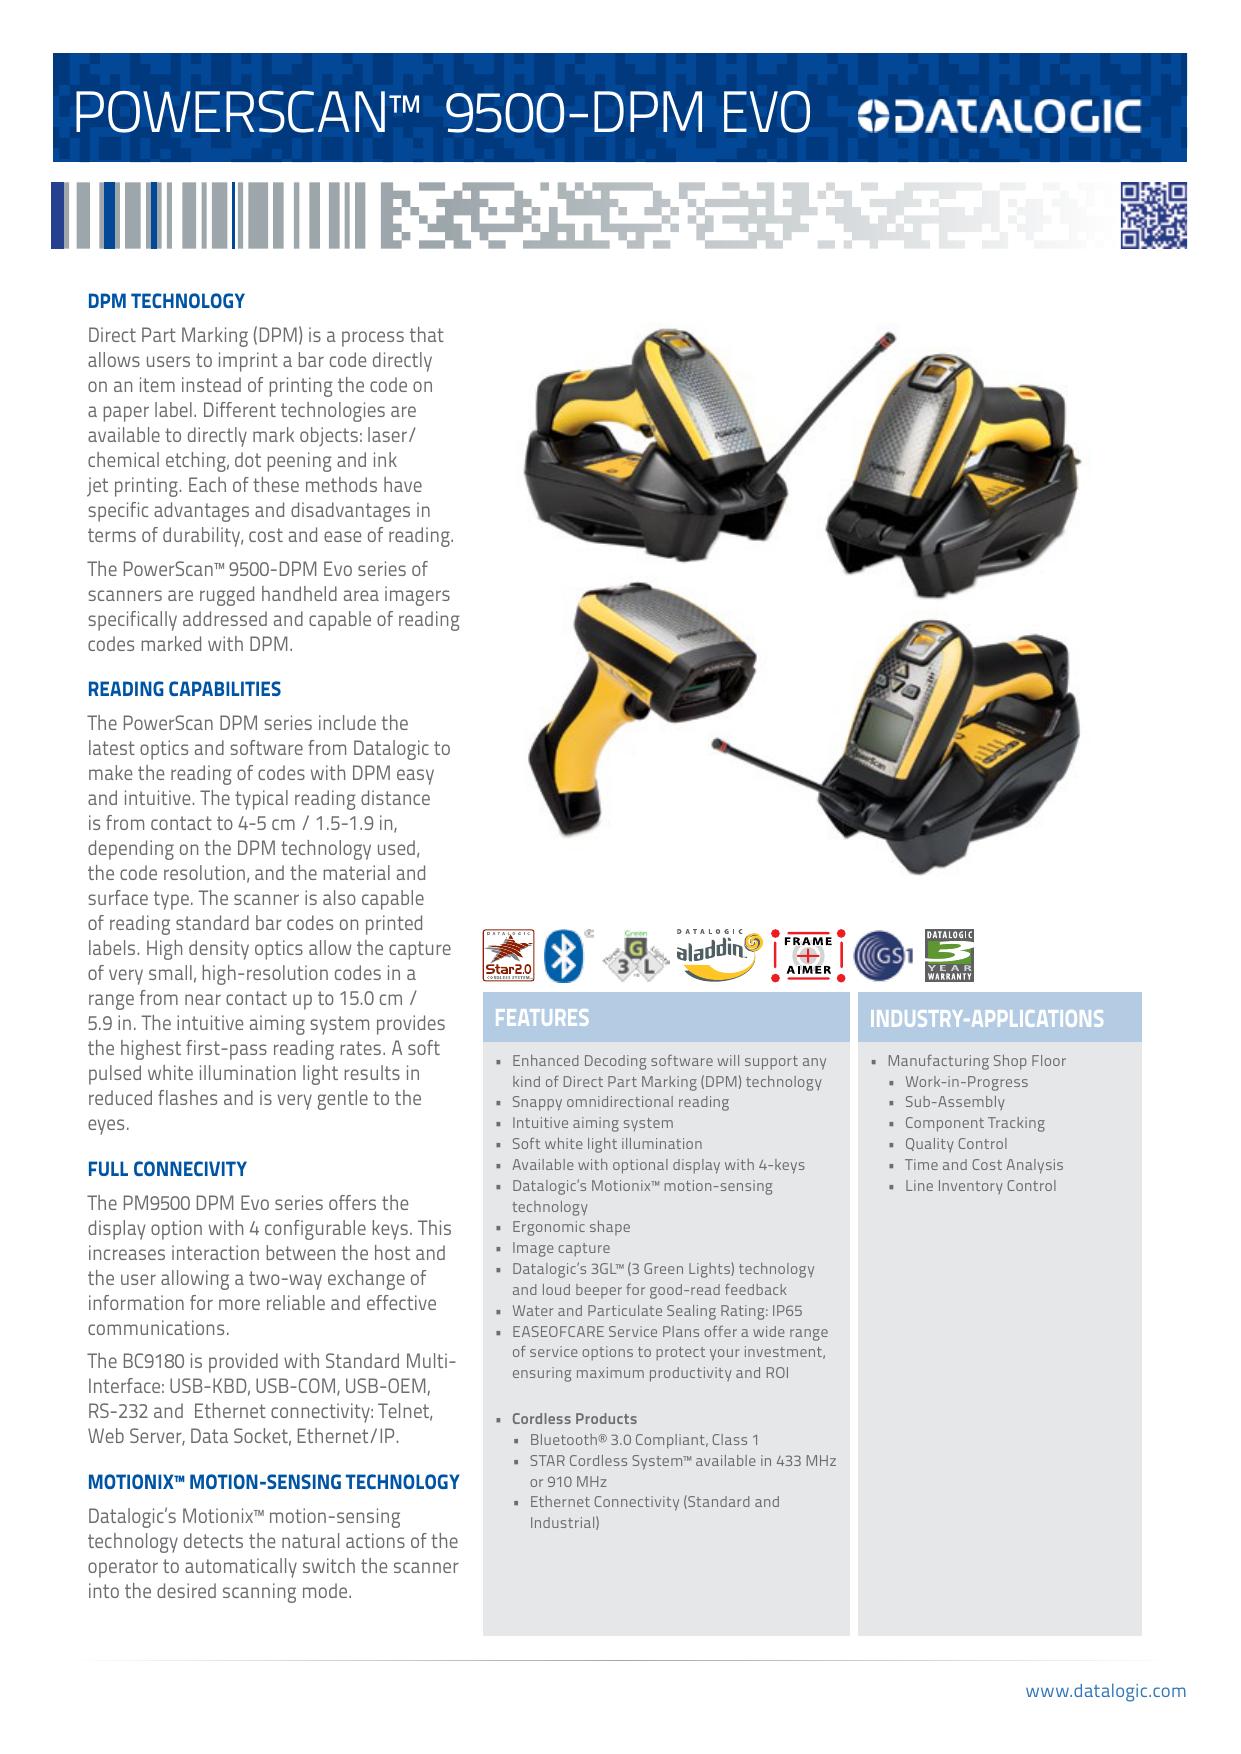 powerscan™ 9500-dpm evo - Legacy Technology Services